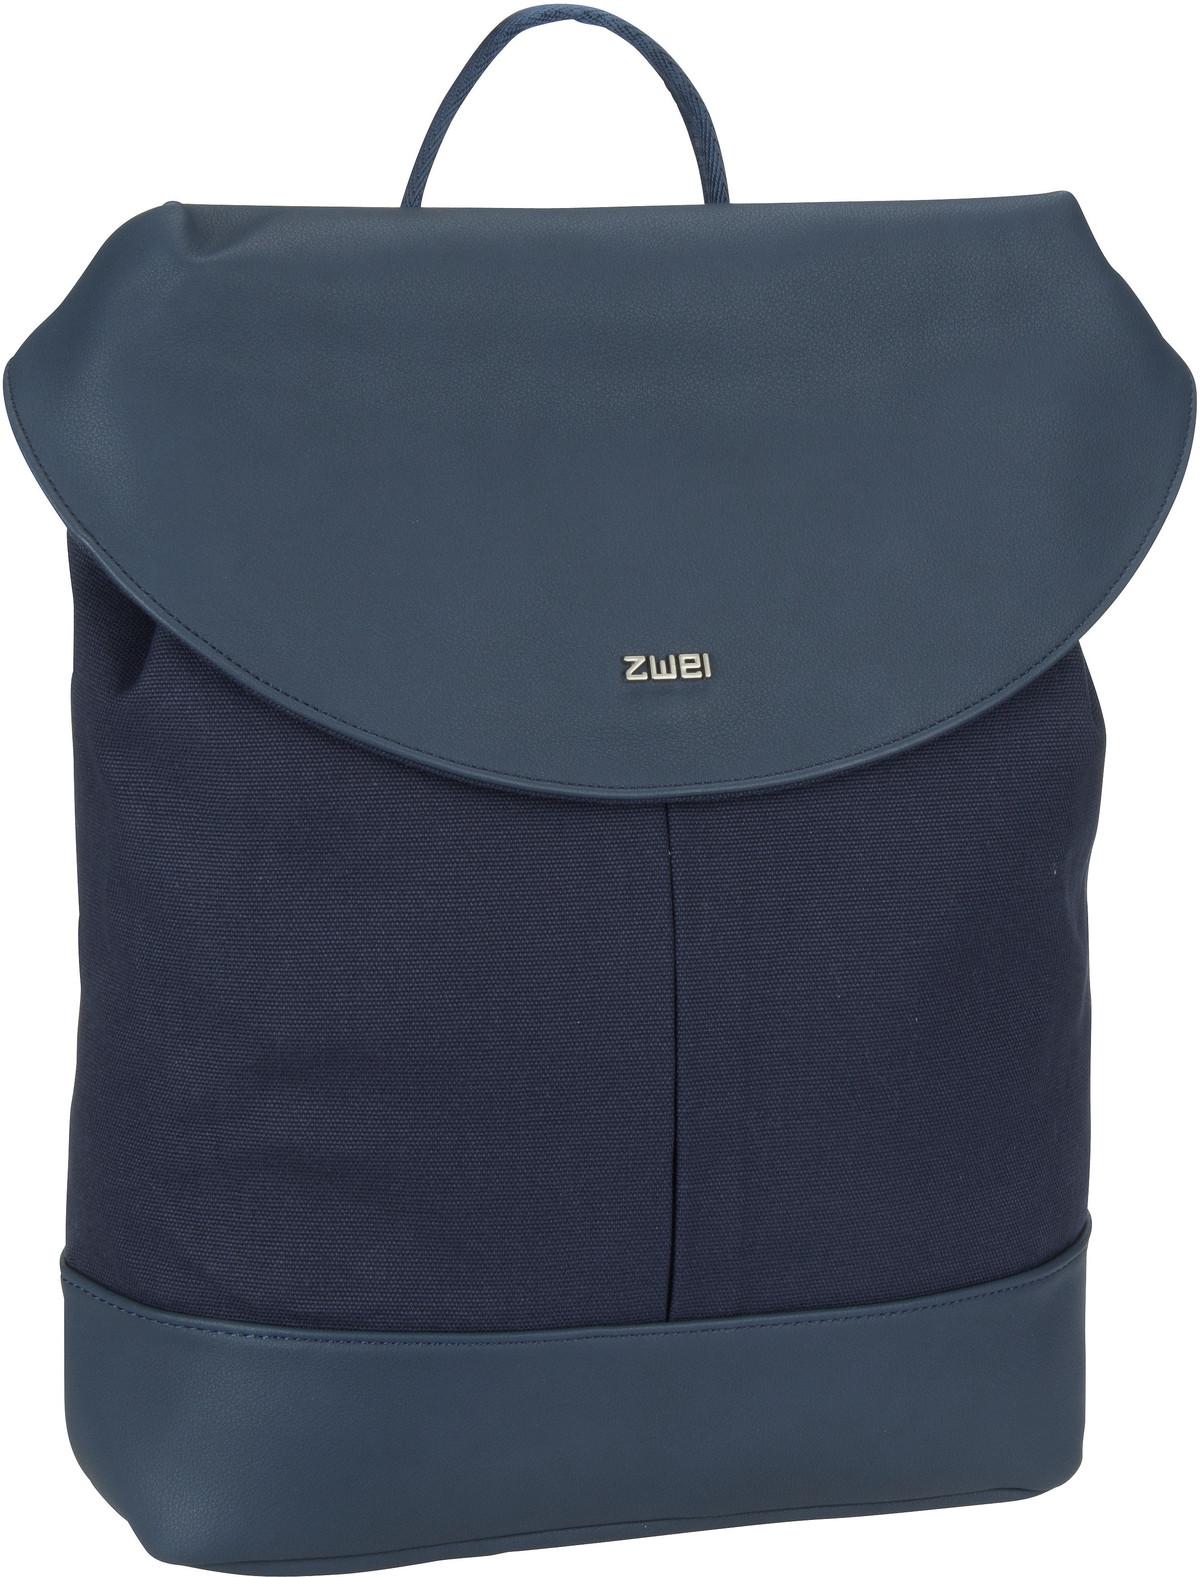 Rucksack / Daypack Paula PAR120 Blue (11 Liter)